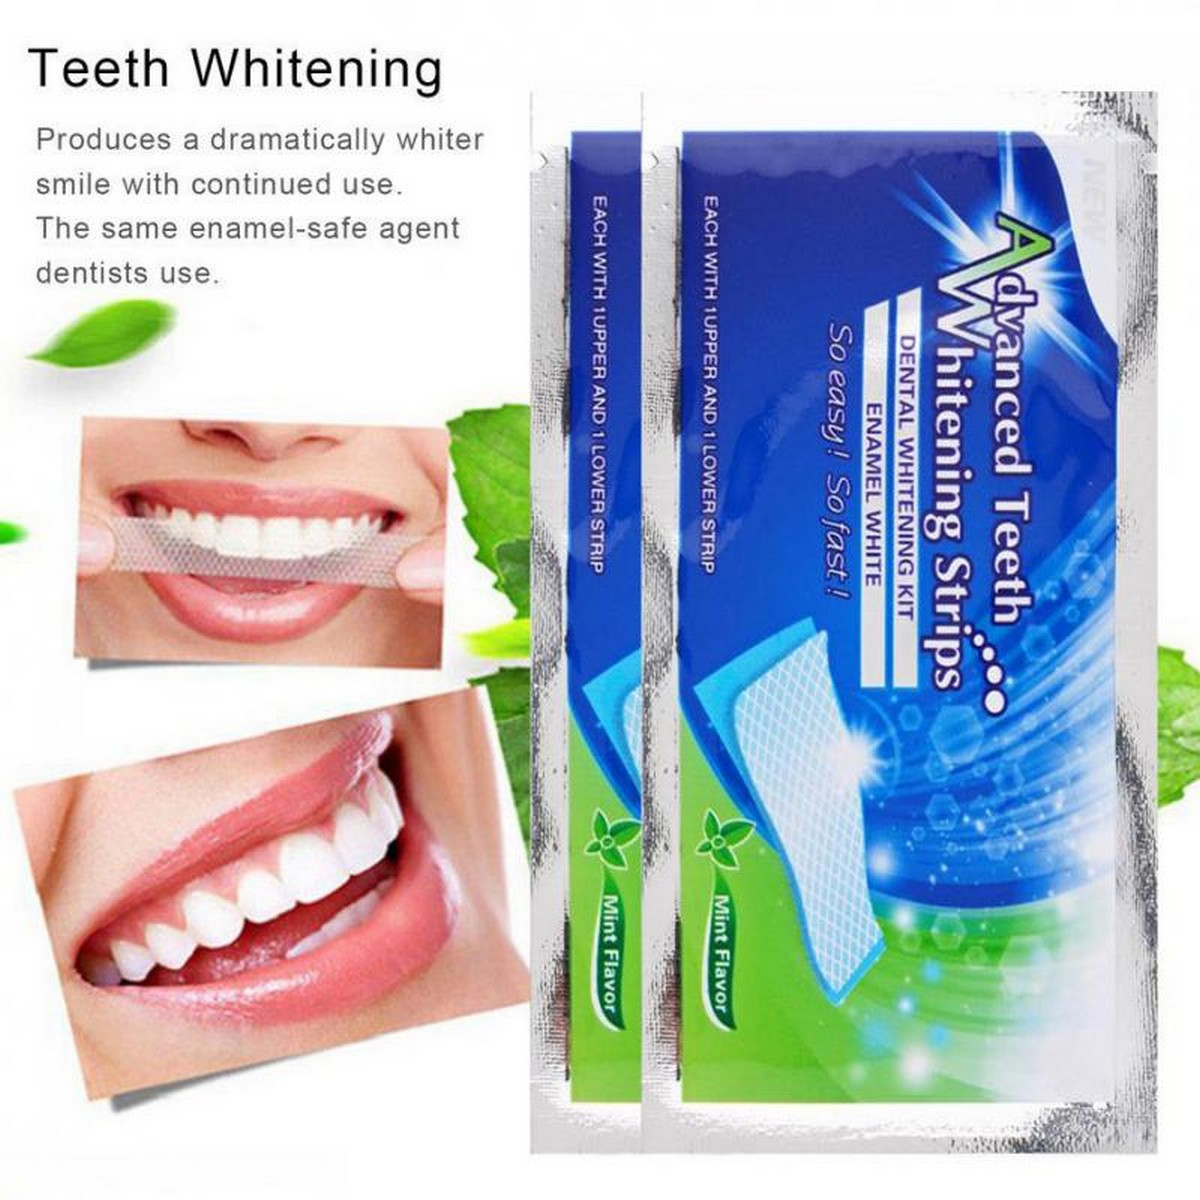 2Pcs/Bag Advanced Teeth Whitening Strips Teeth Oral Hygiene Care Dental Bleaching Teeth Strips Whitening Dental Bleaching Tools